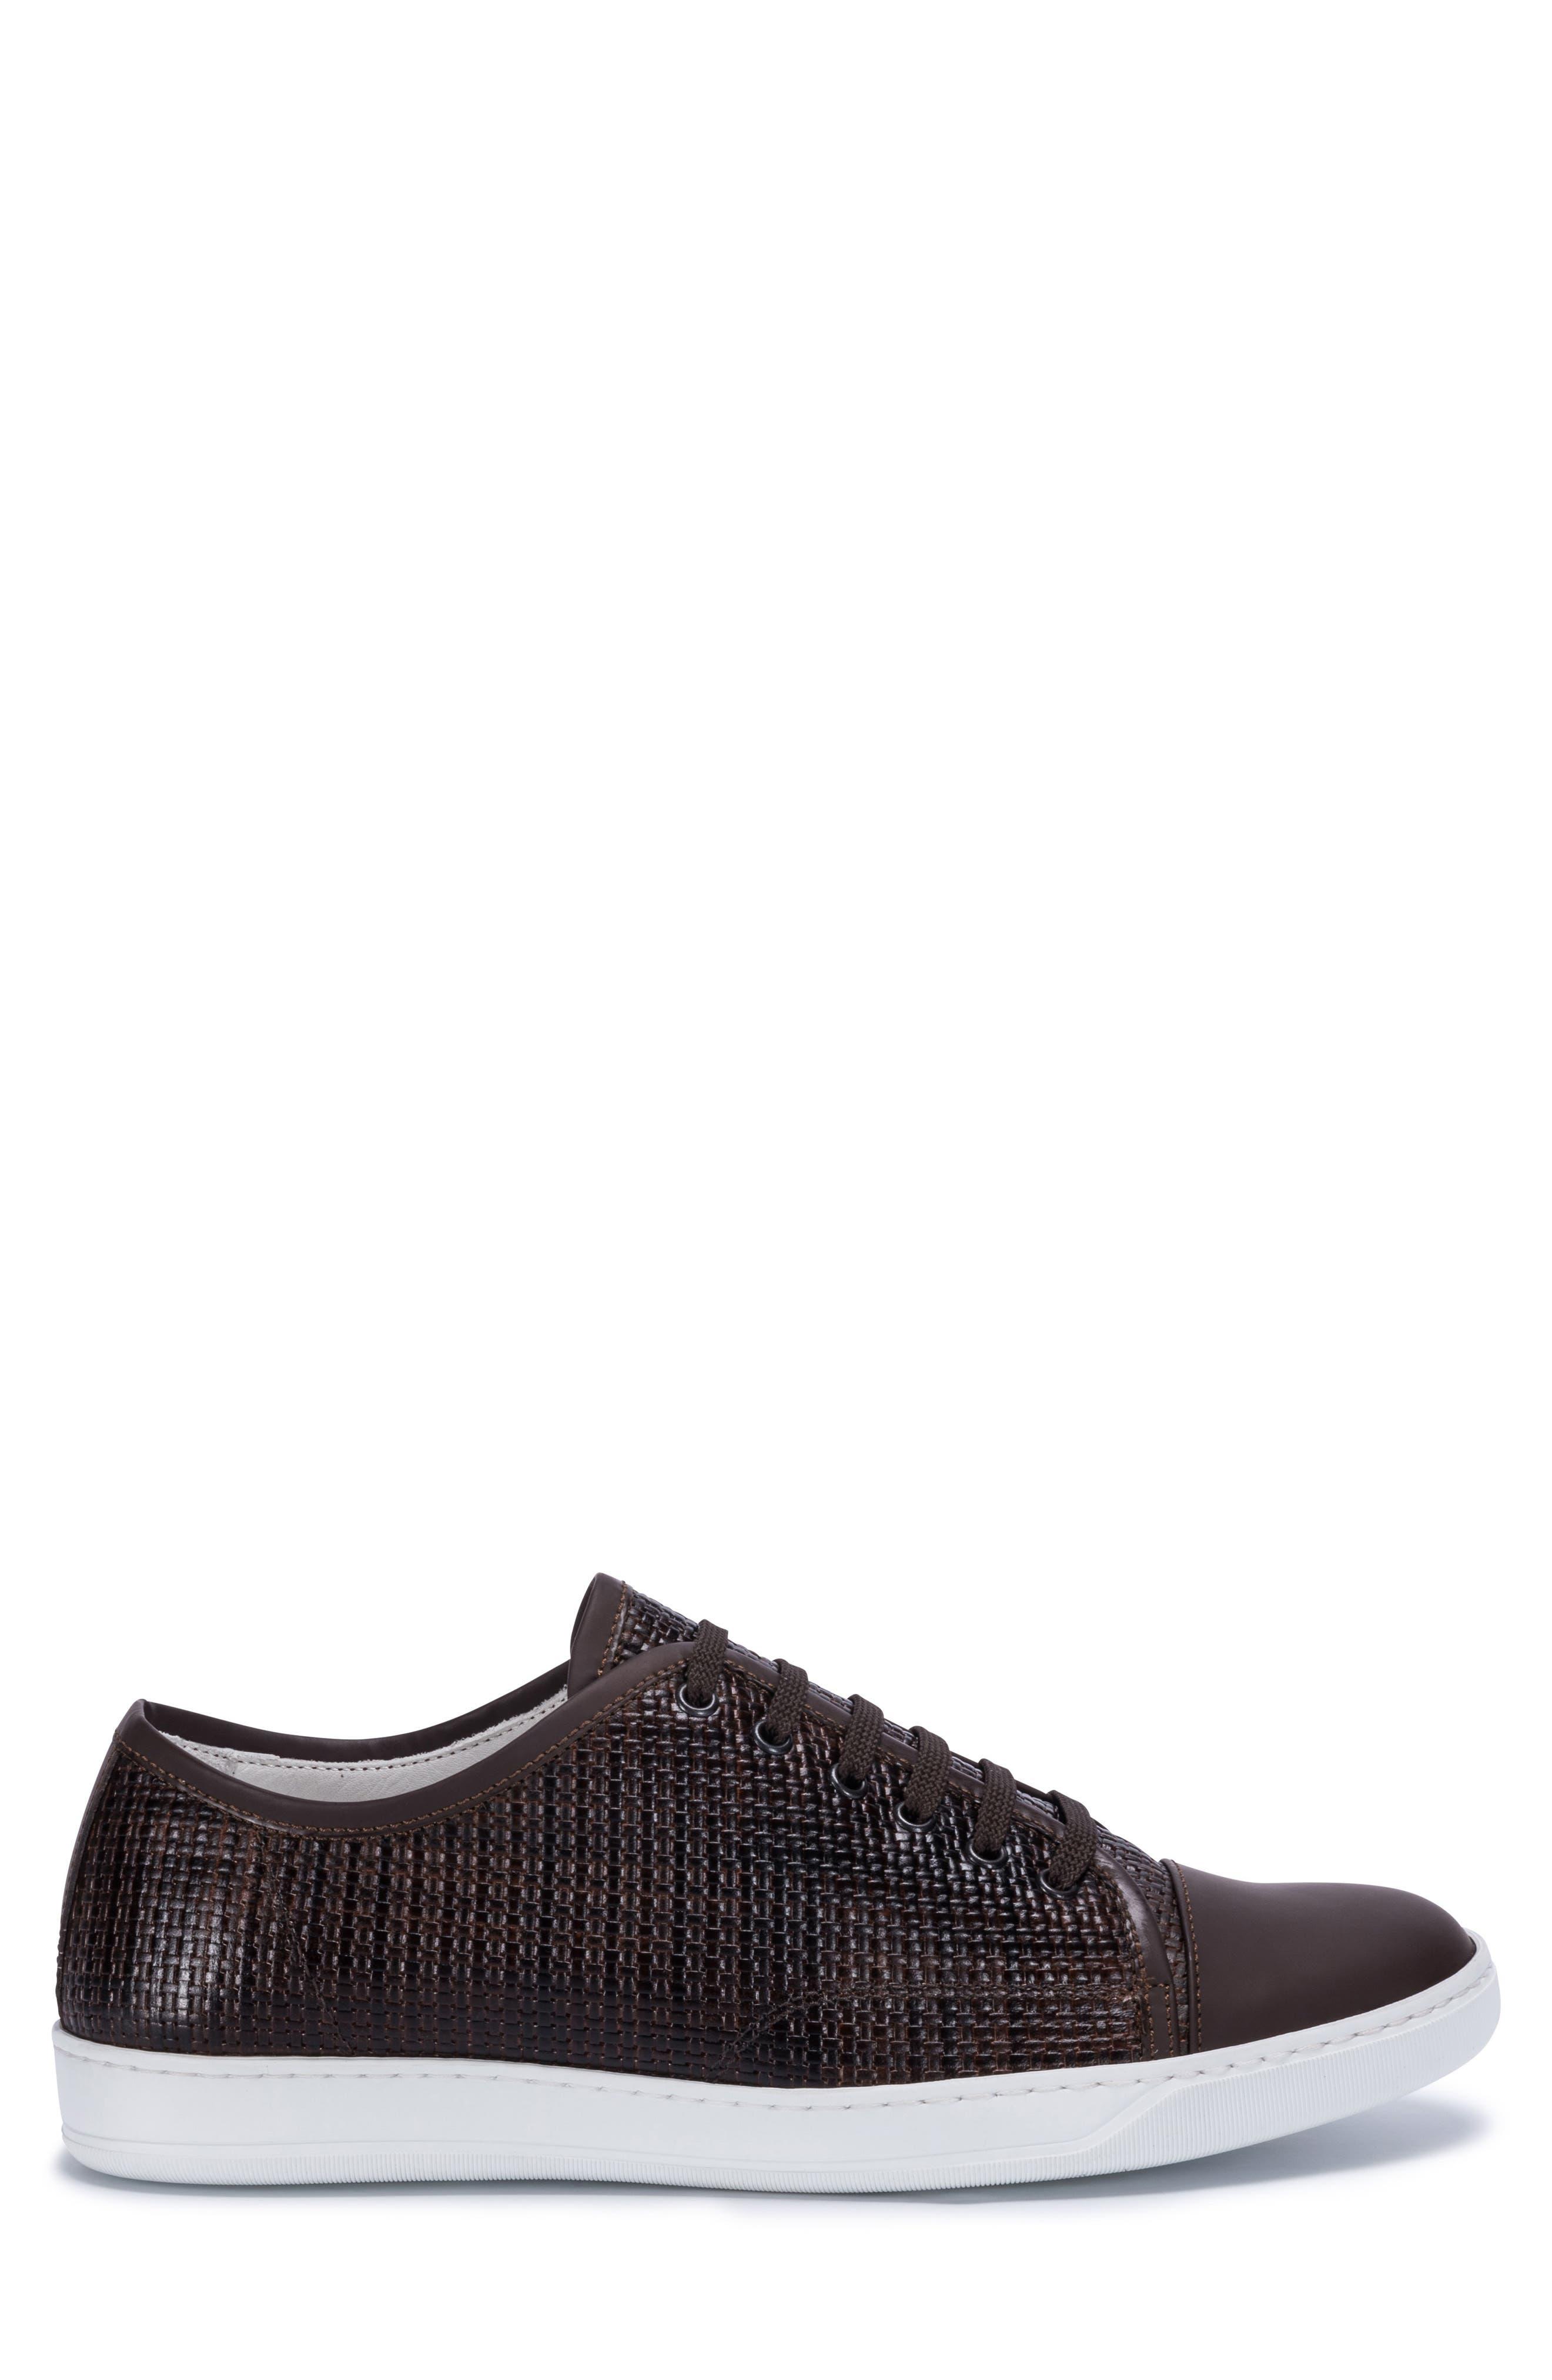 Cinque Terre Woven Cap Toe Sneaker,                             Alternate thumbnail 3, color,                             Brown Leather